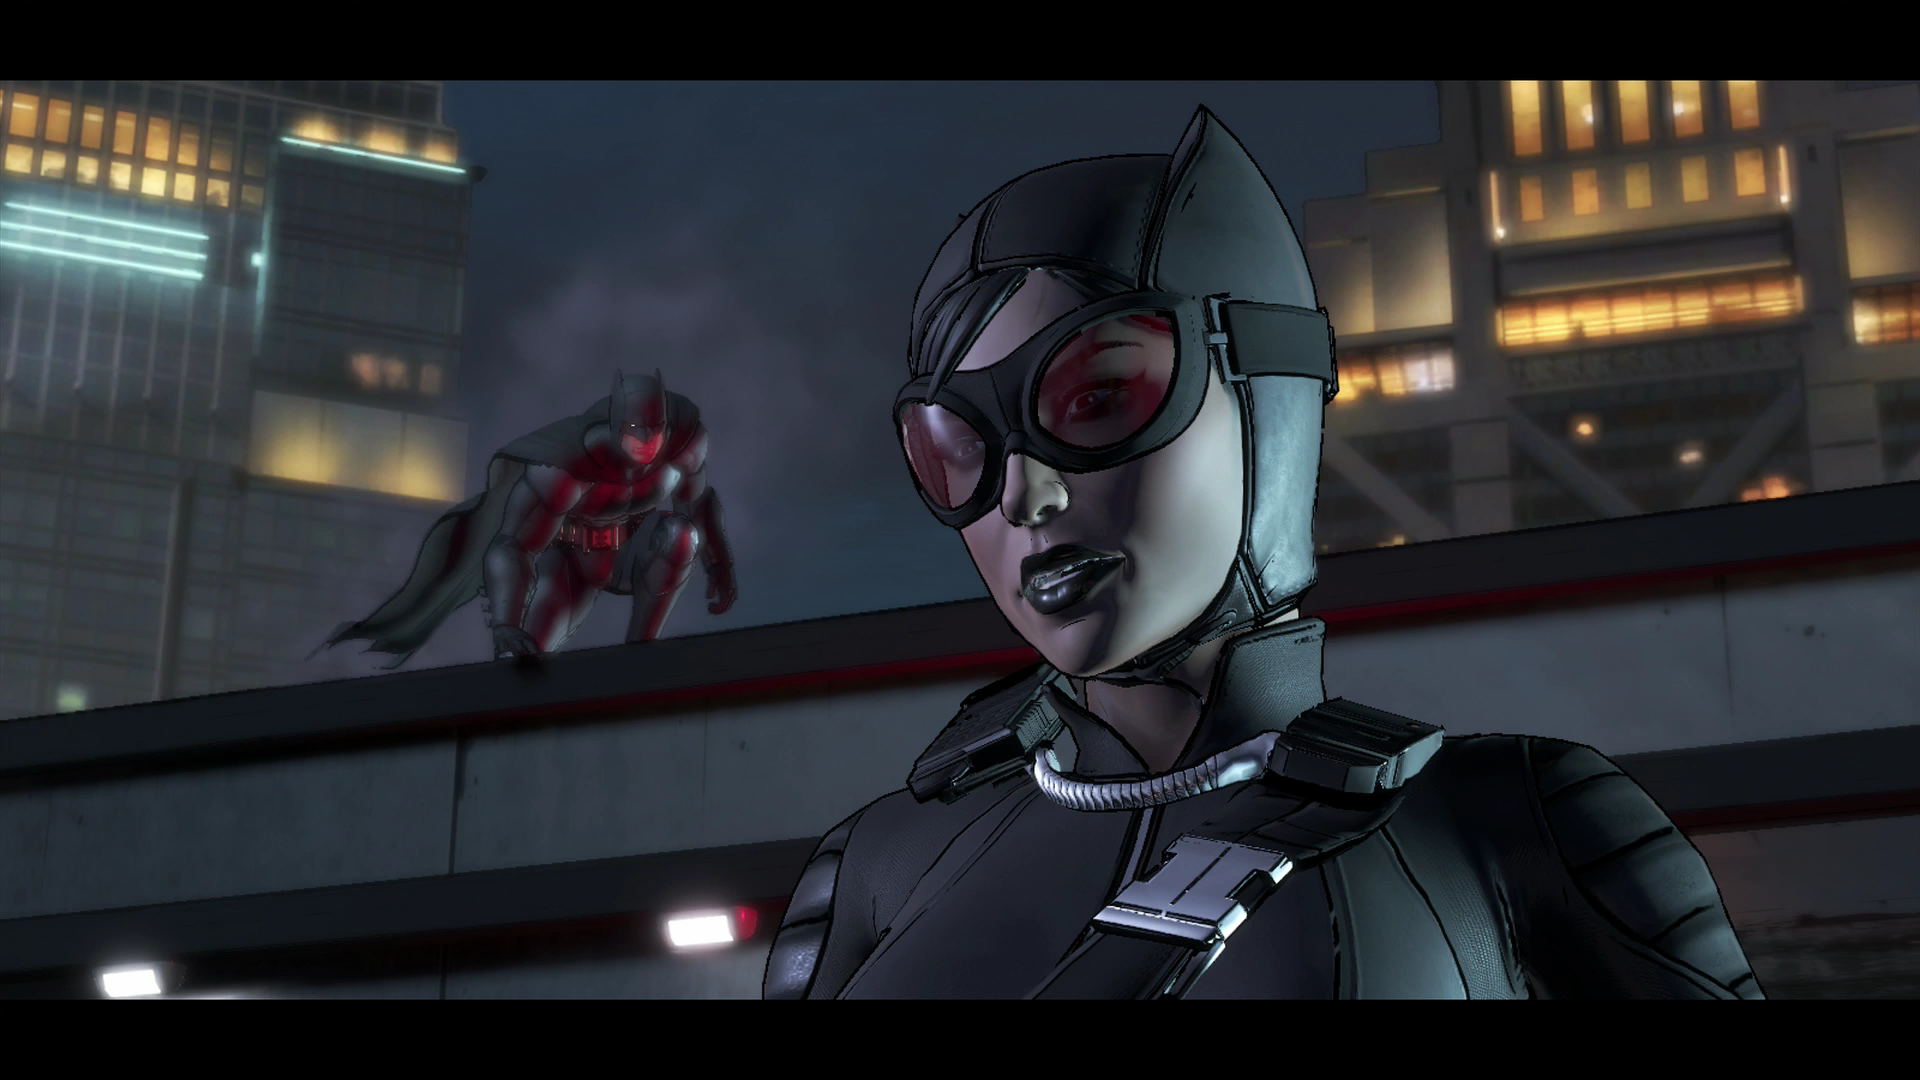 Batman im Kurztest: Interaktiver Milchbubi - Batman trifft Catwoman. (Screenshot: Golem.de)